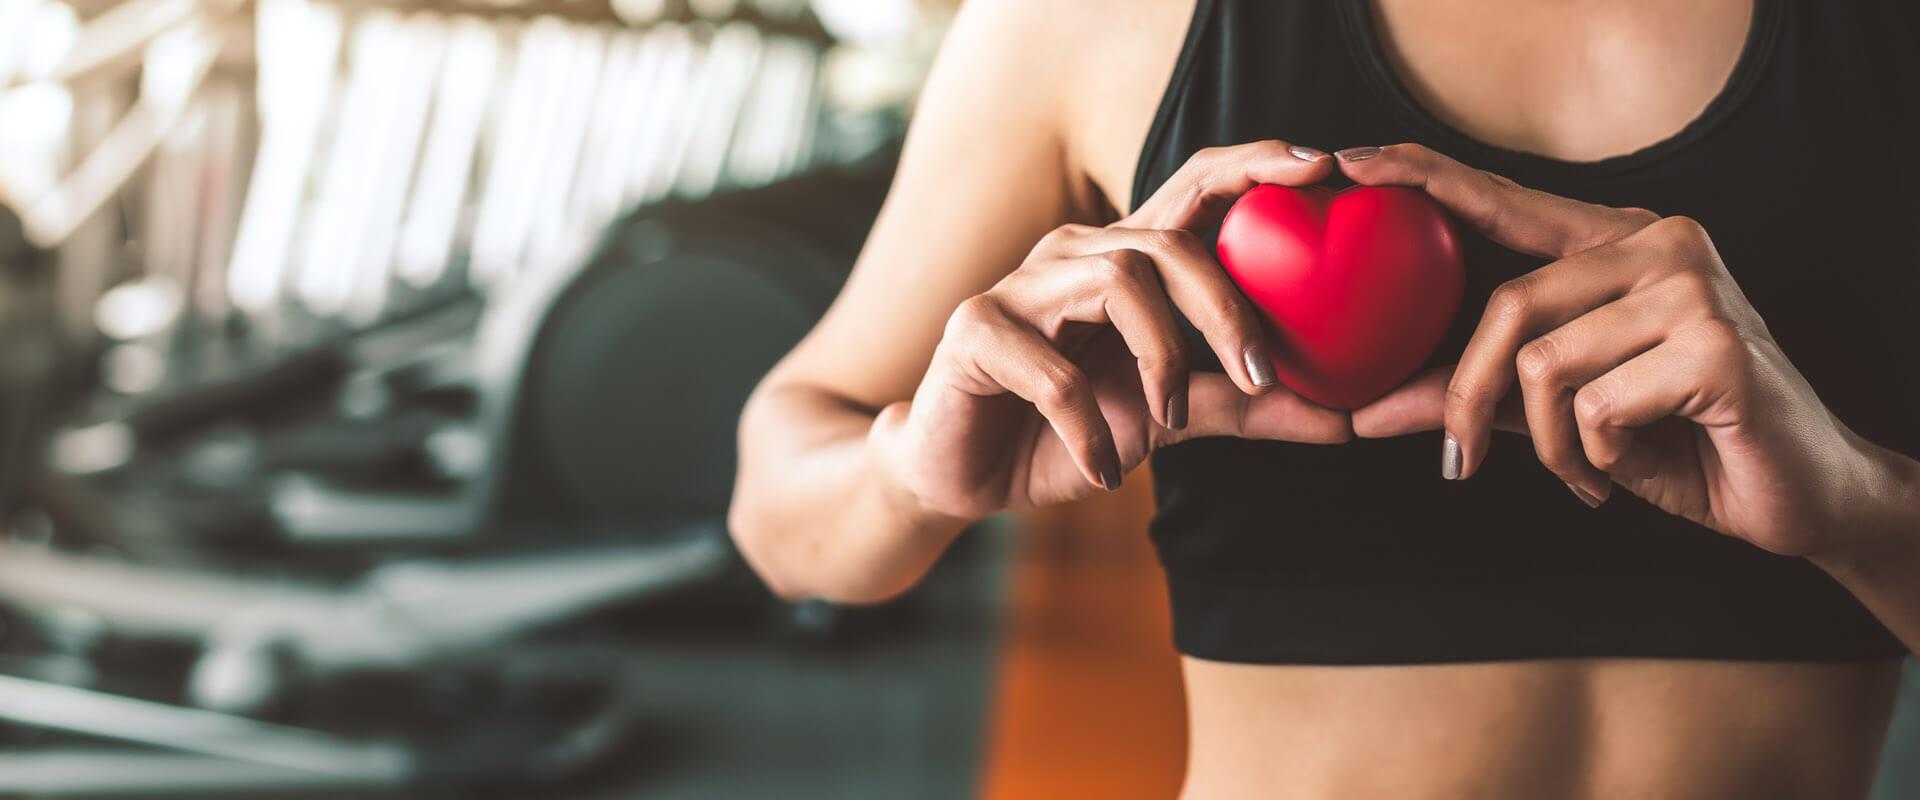 ejercicio aeróbico salud cardiovascular